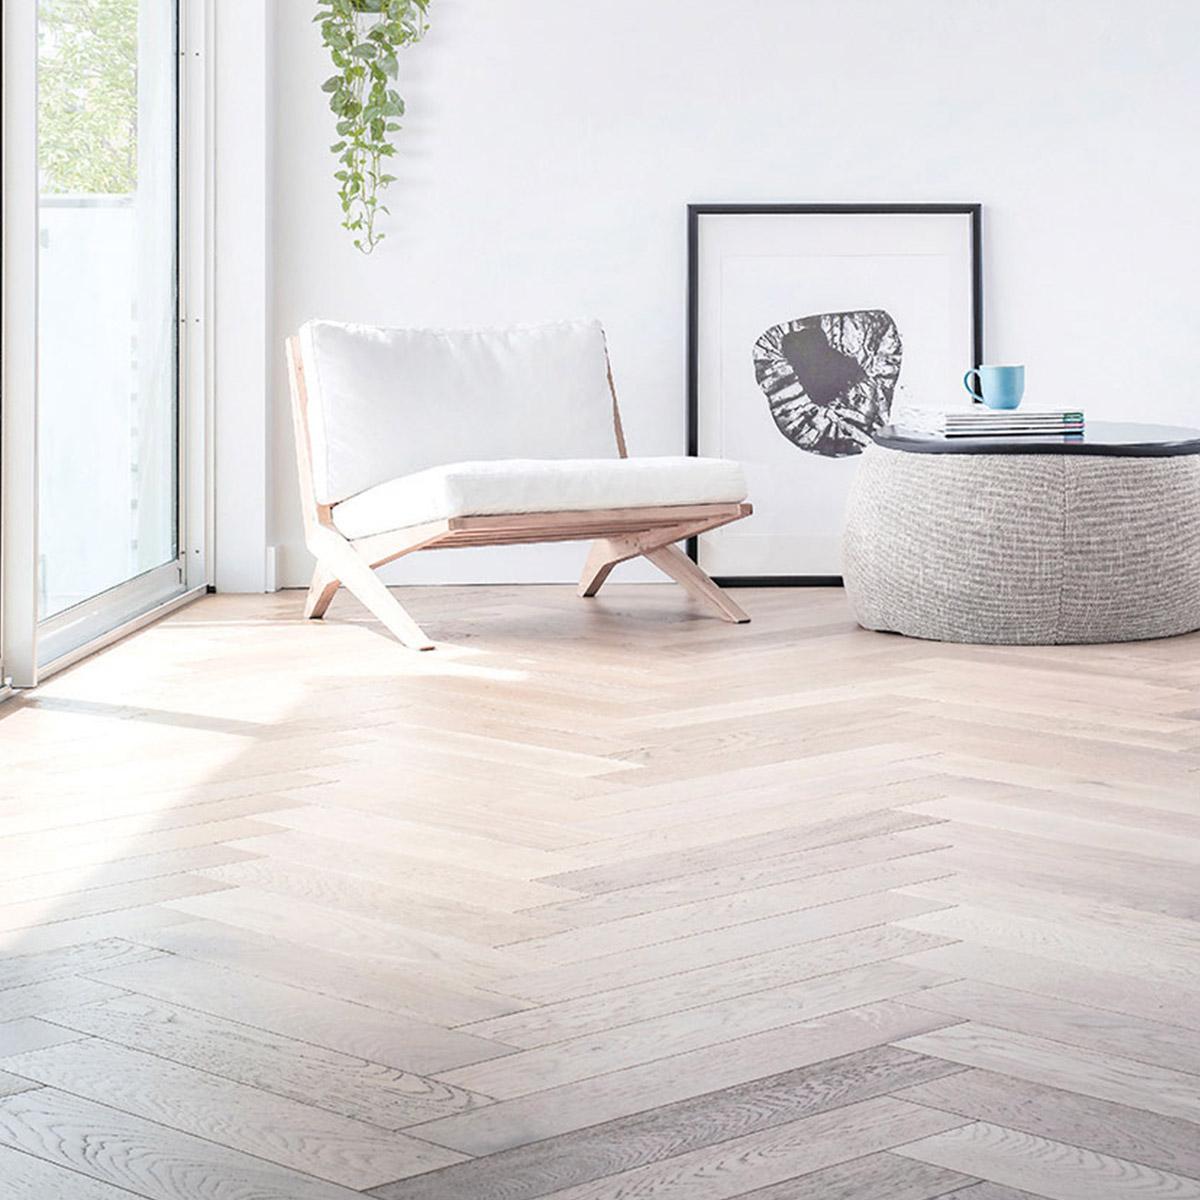 De Marque Oak Timber Flooring - Herringbone - Sauvignon - Stone3 Brisbane